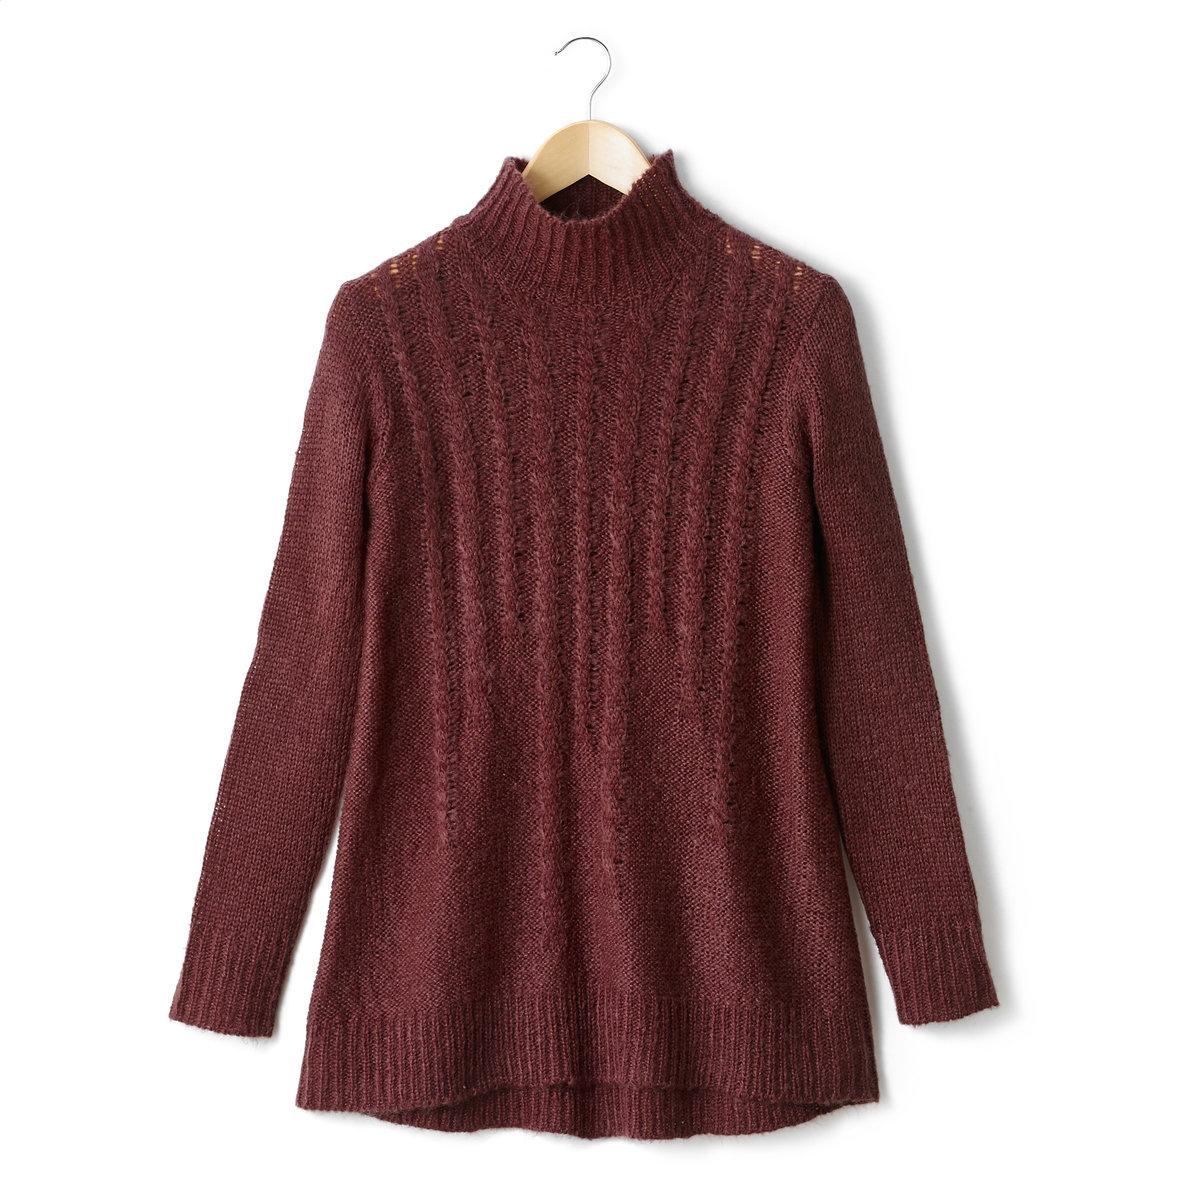 Пуловер-туника из трикотажа джерси крупной вязки, 100% акрила